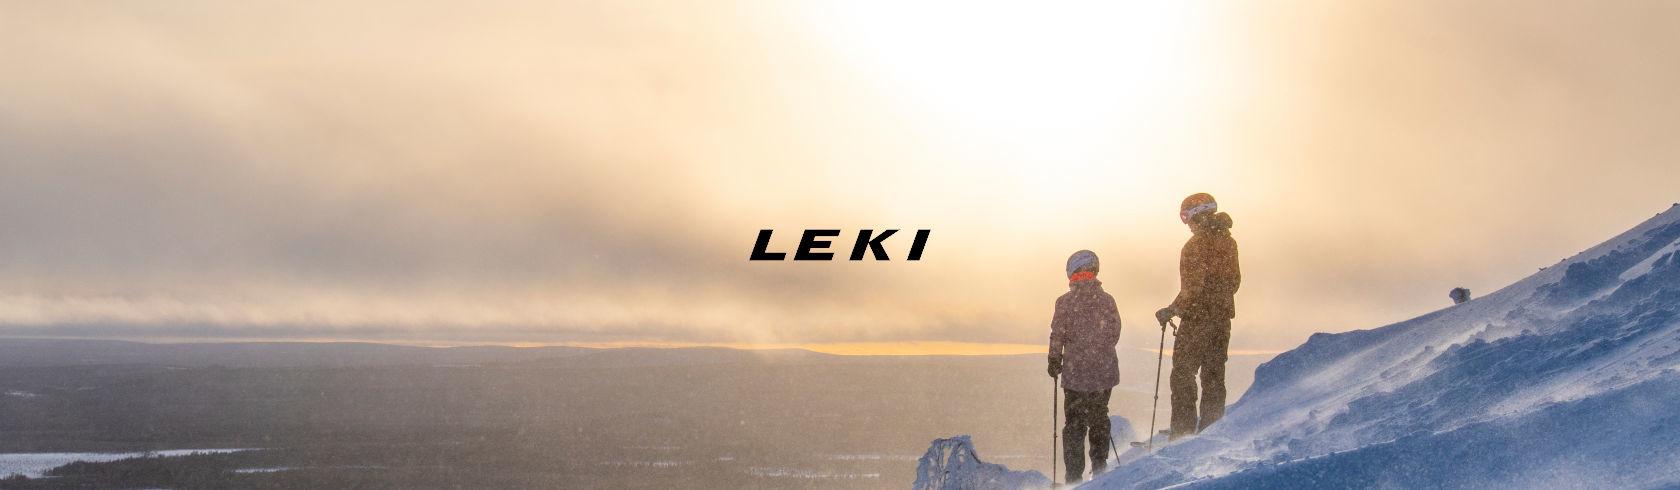 Leki poles brand logo